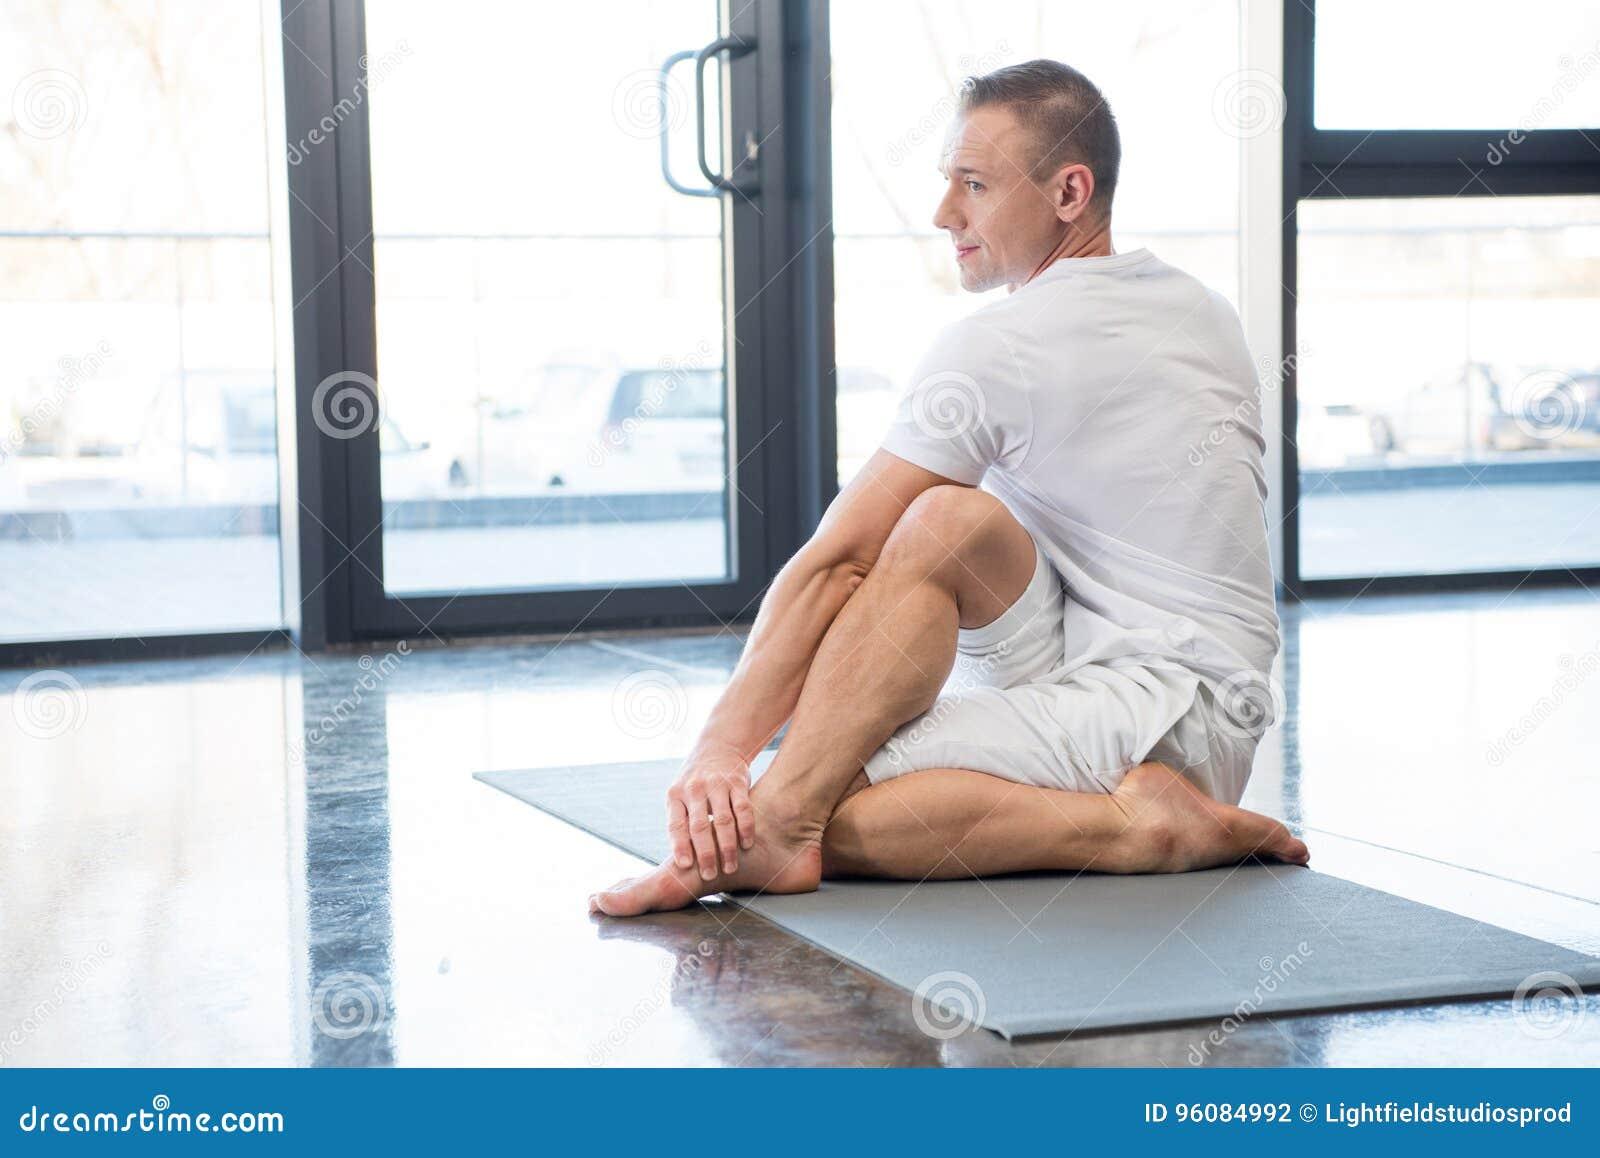 Sportsman in half spinal twist pose sitting on yoga mat